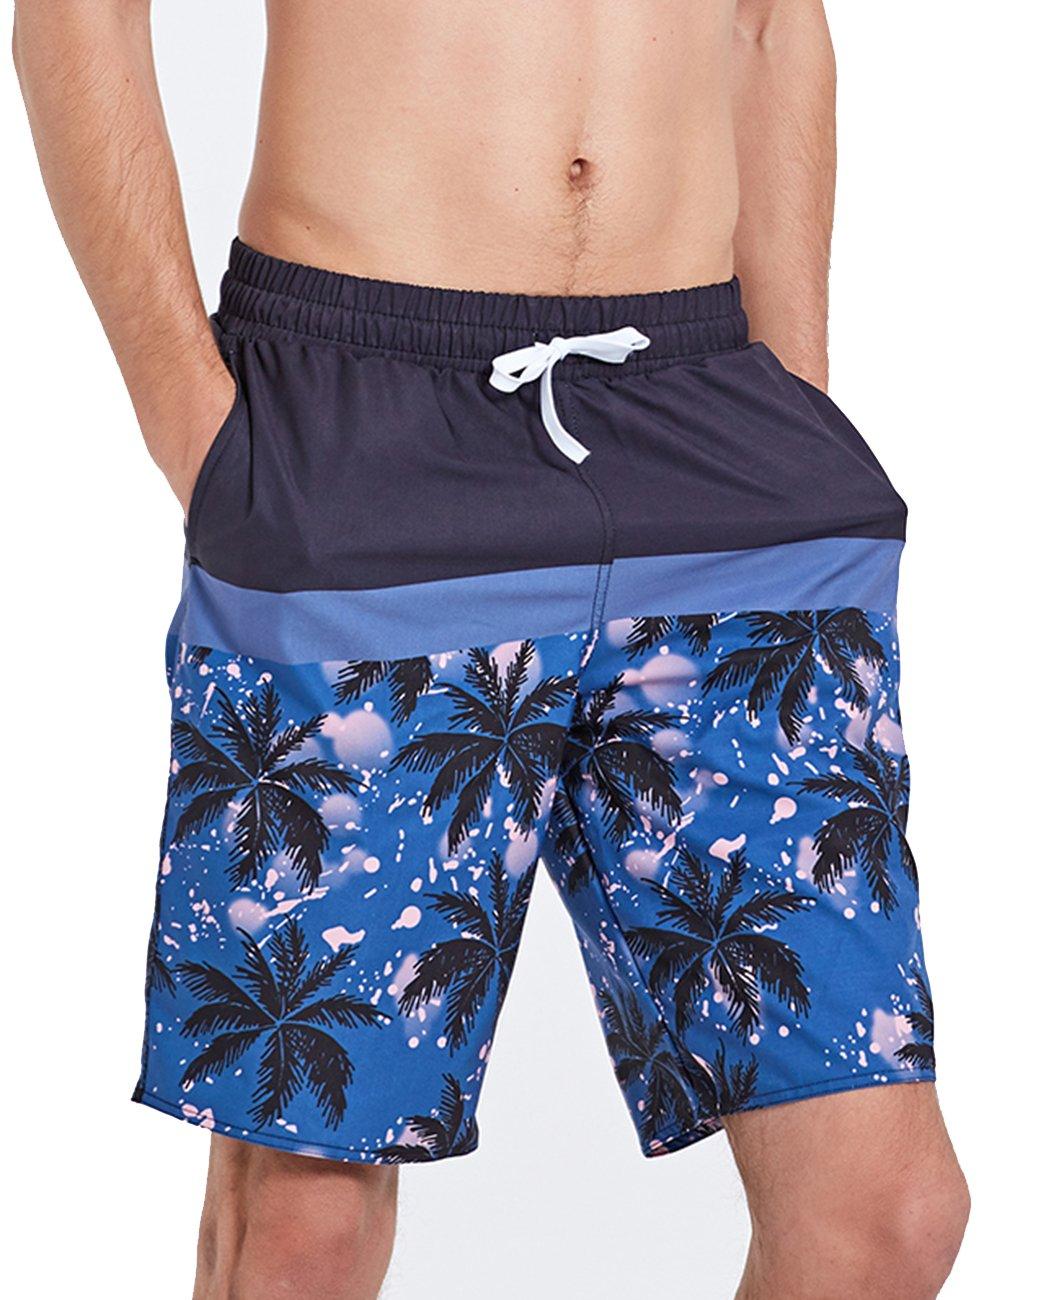 iDrawl Men's Beach Surf Shorts Printed Swim Trunk Pants Quick Dry Casual Beach Swimwear